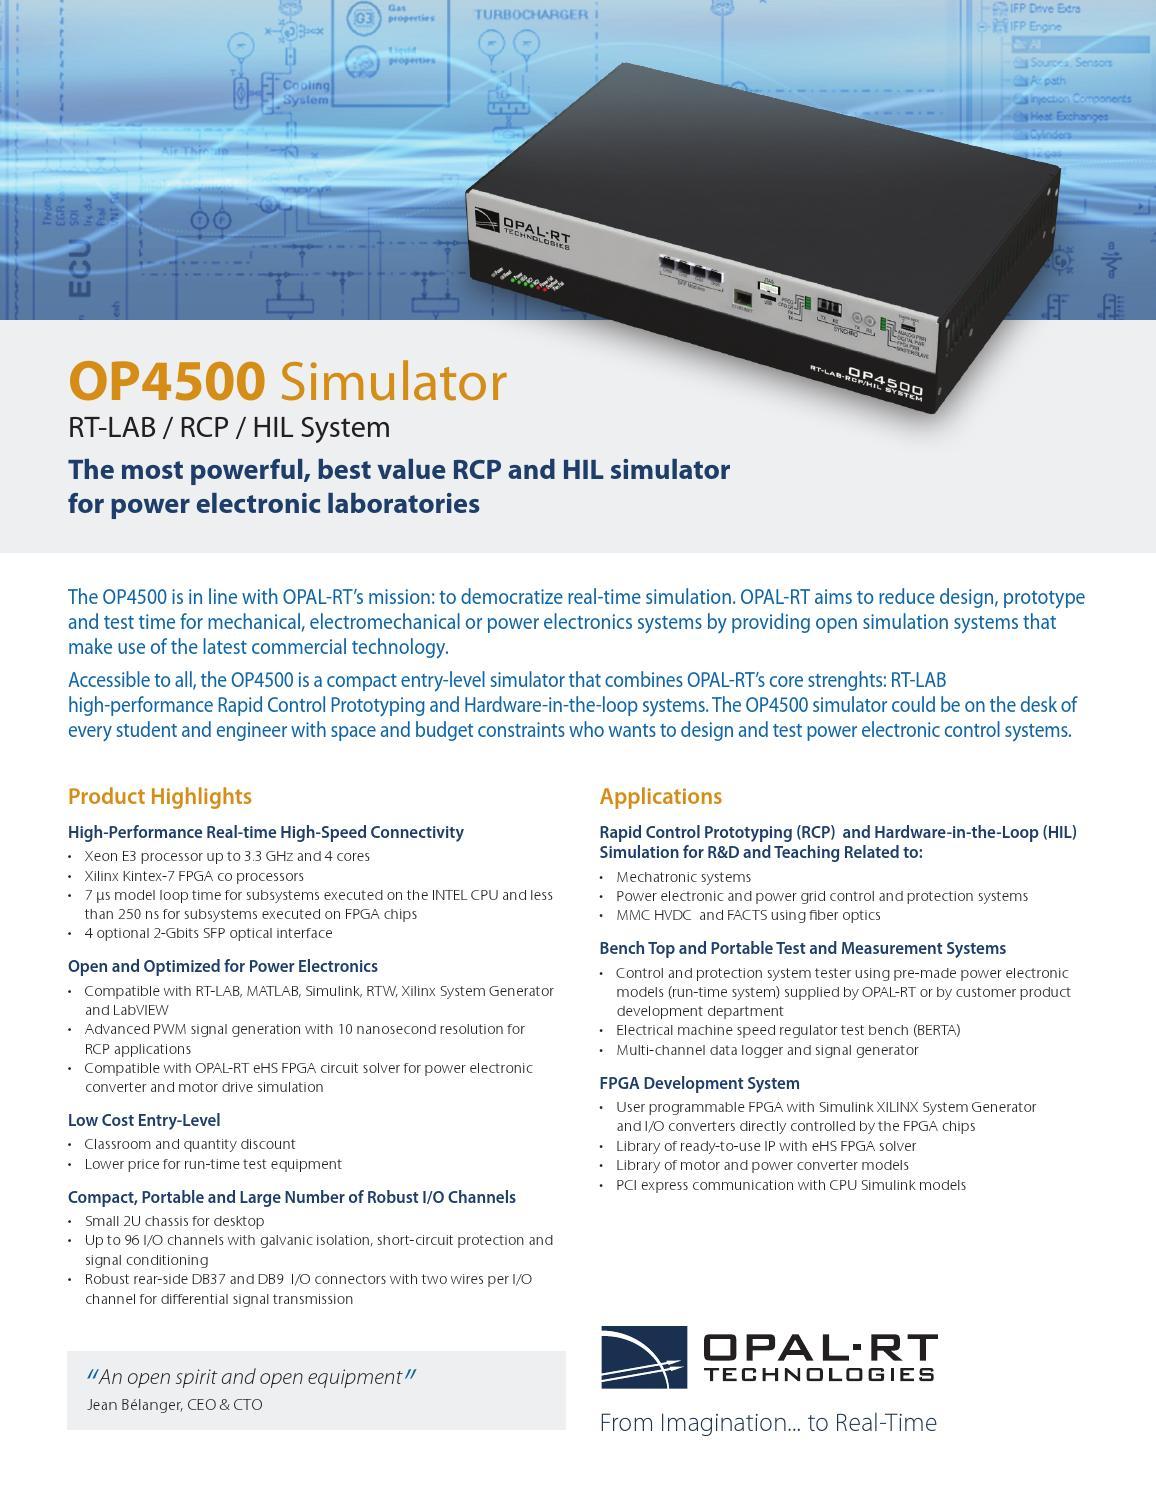 OP4500 Datasheet by OPAL-RT TECHNOLOGIES - issuu